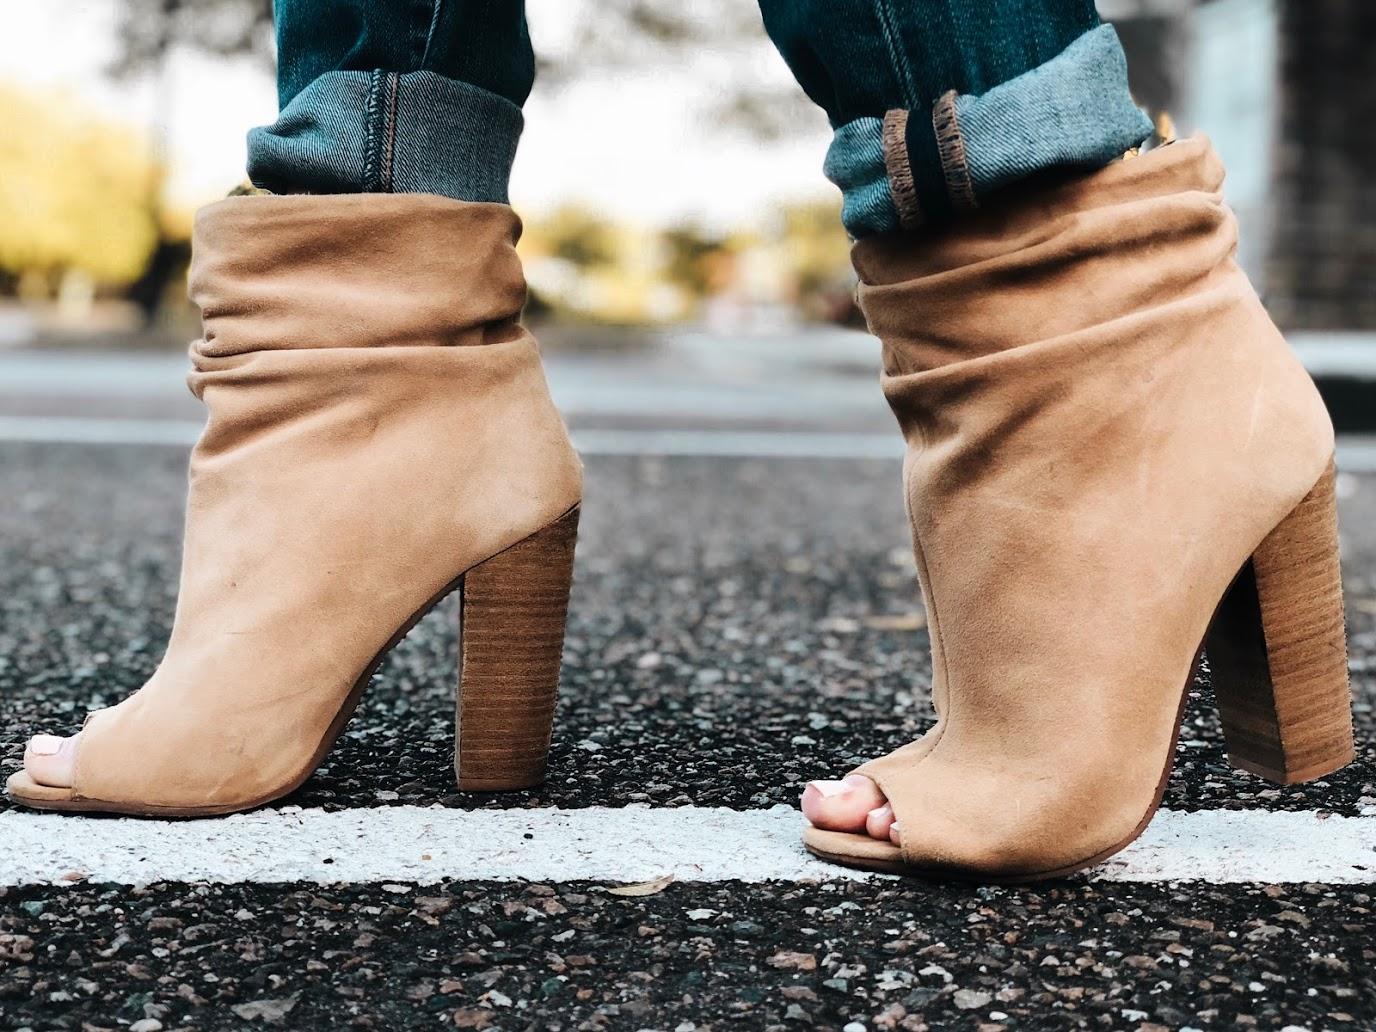 laurel peep toe booties; favorite fall transition staple